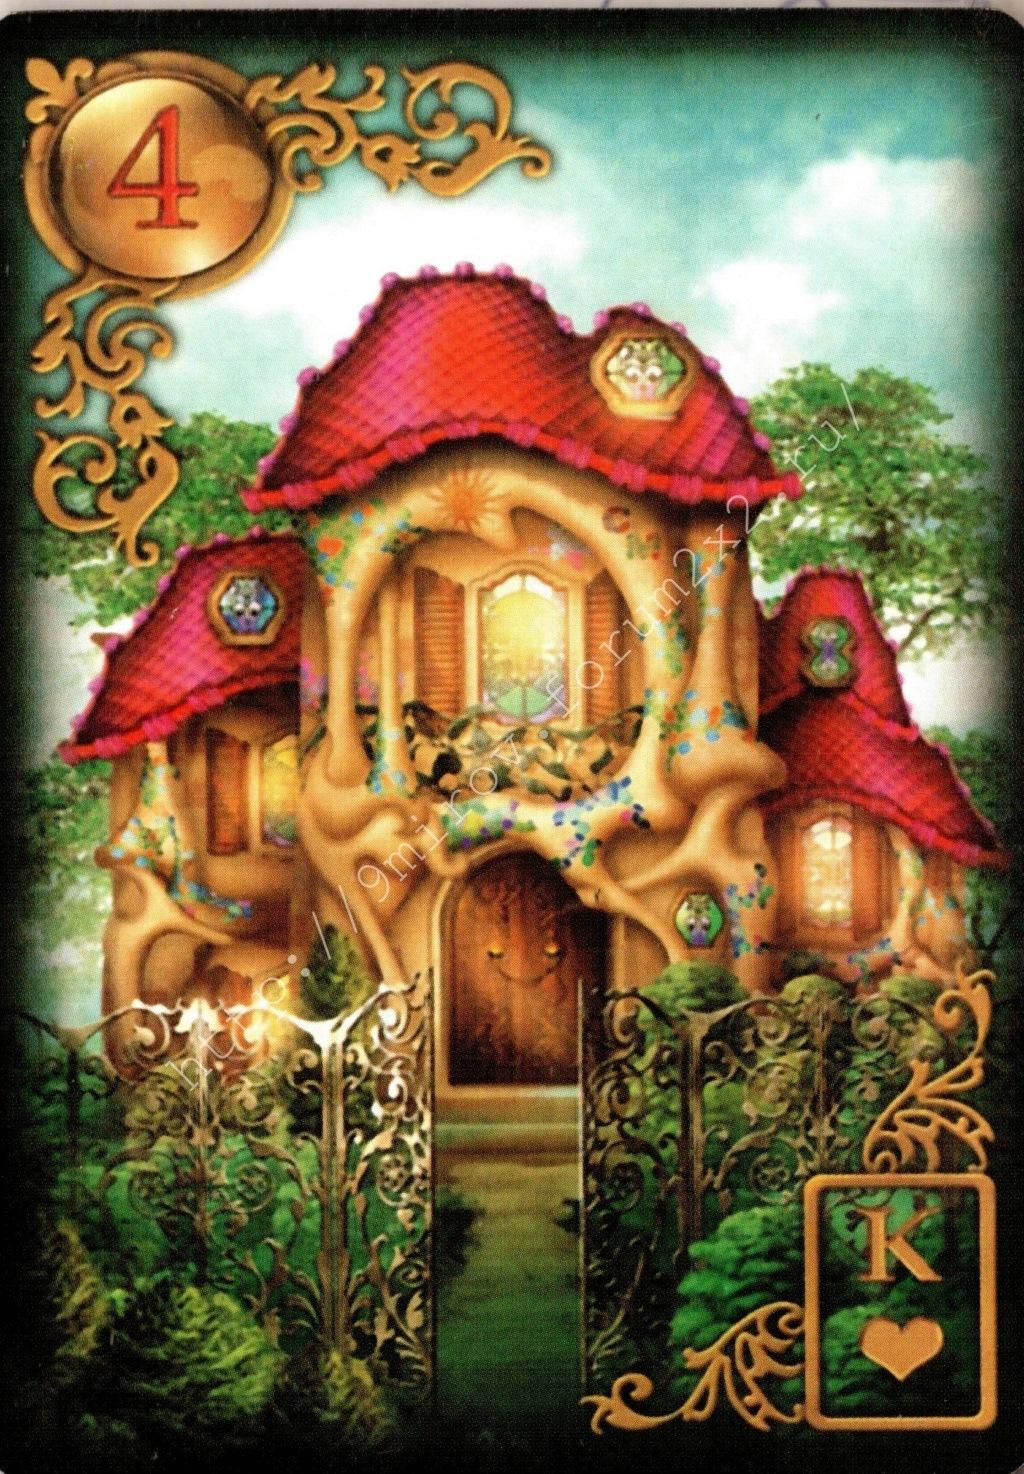 Золотые мечты Ленорман (Расширенное издание) | Gilded Reverie Lenormand. Галерея.  Water101